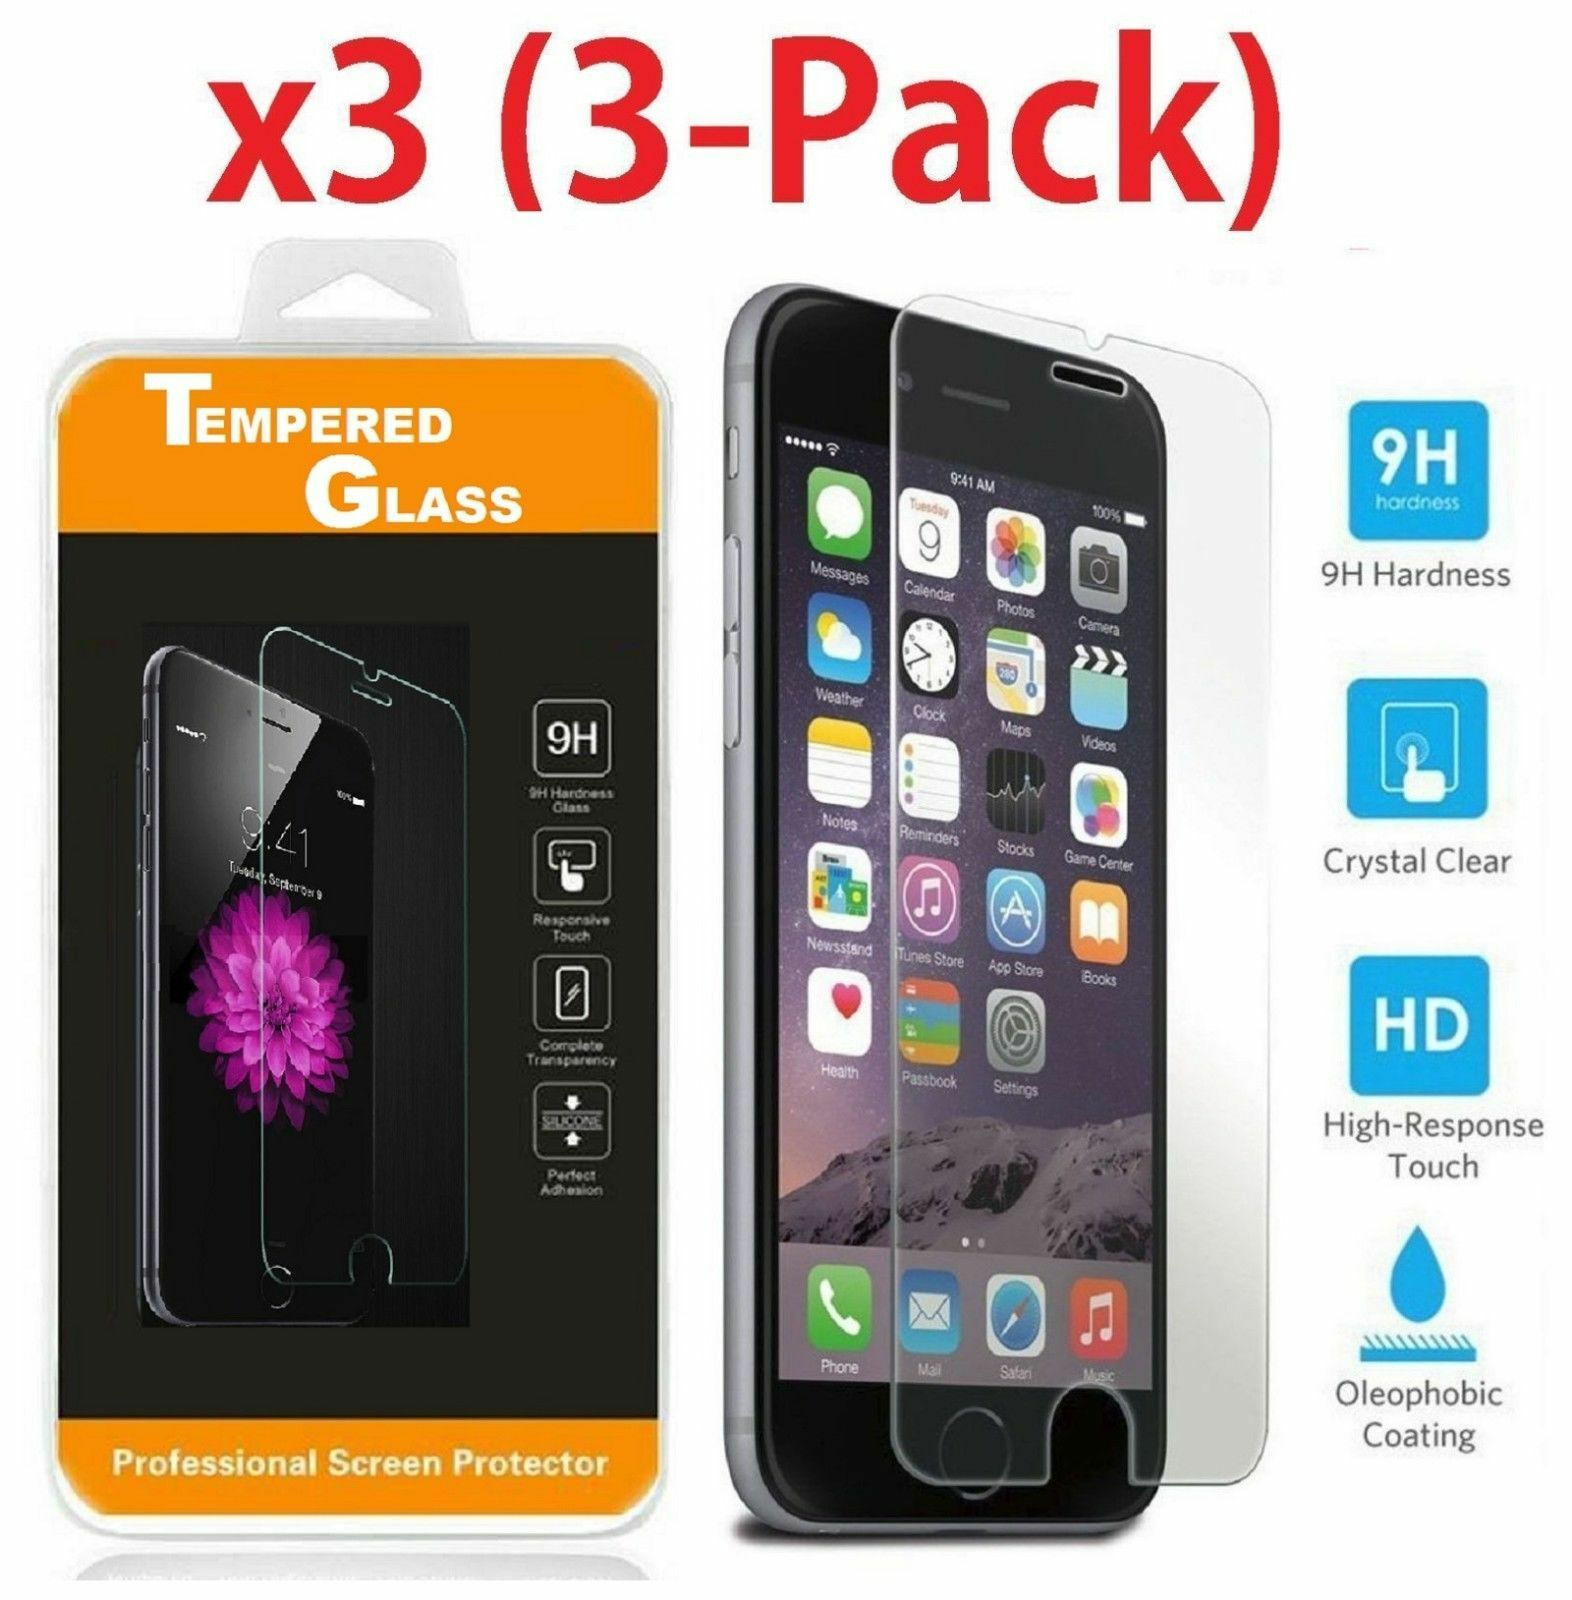 Premium Real Screen Protector Tempered Glass Film For iPhone 6 7 8 Plus Xs Max -   10 - Premium Real Screen Protector Tempered Glass Film For iPhone 6 7 8 Plus Xs Max